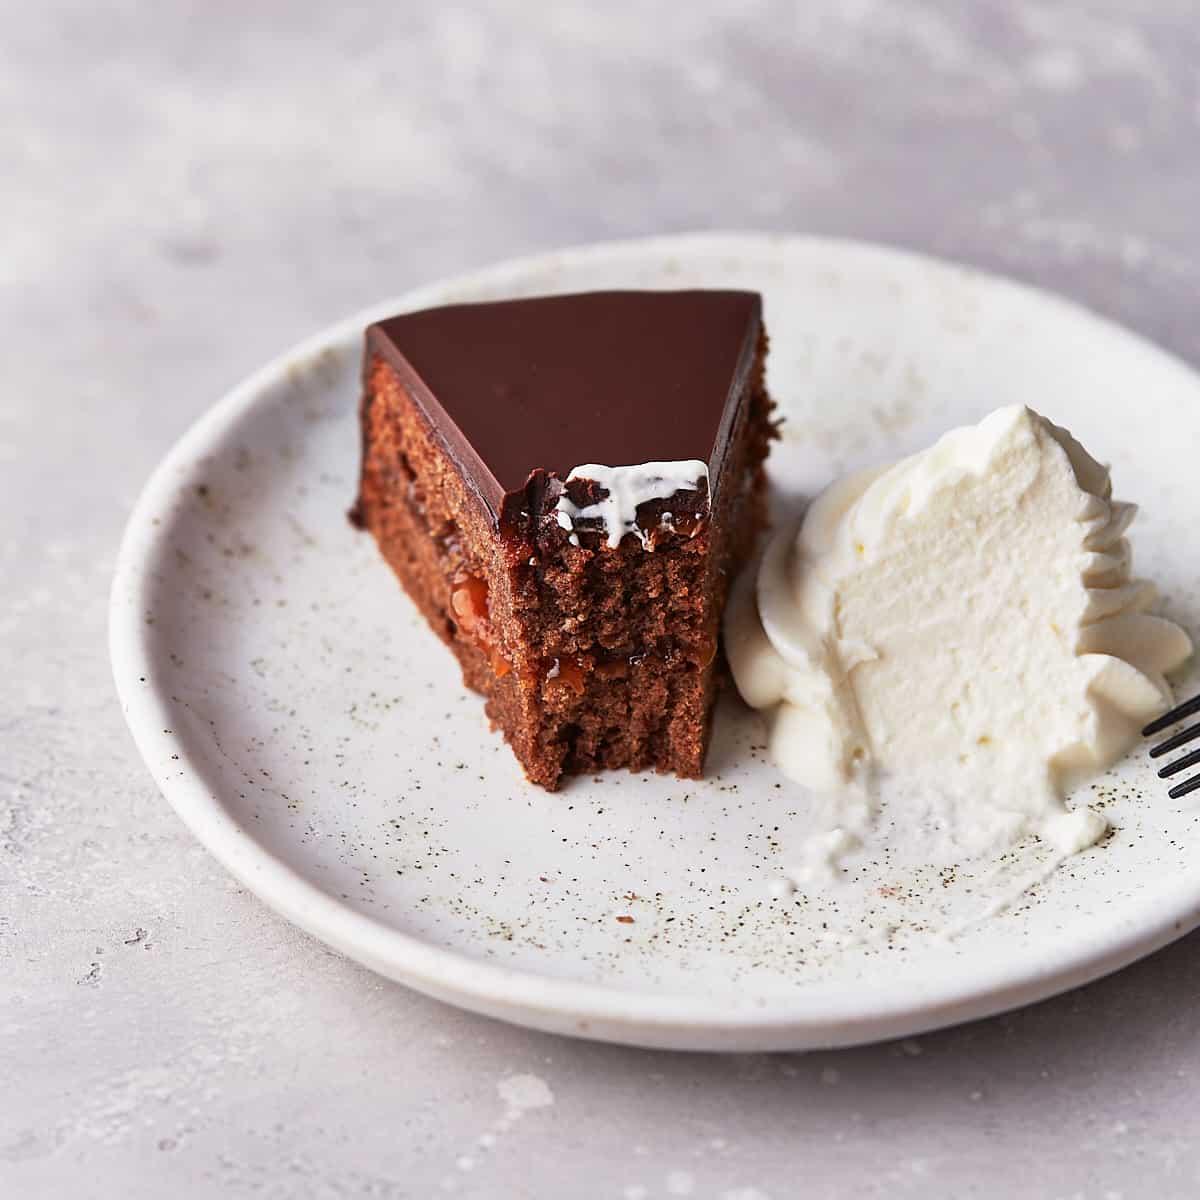 Decorative picture of bitten sacher torte on dessert plate